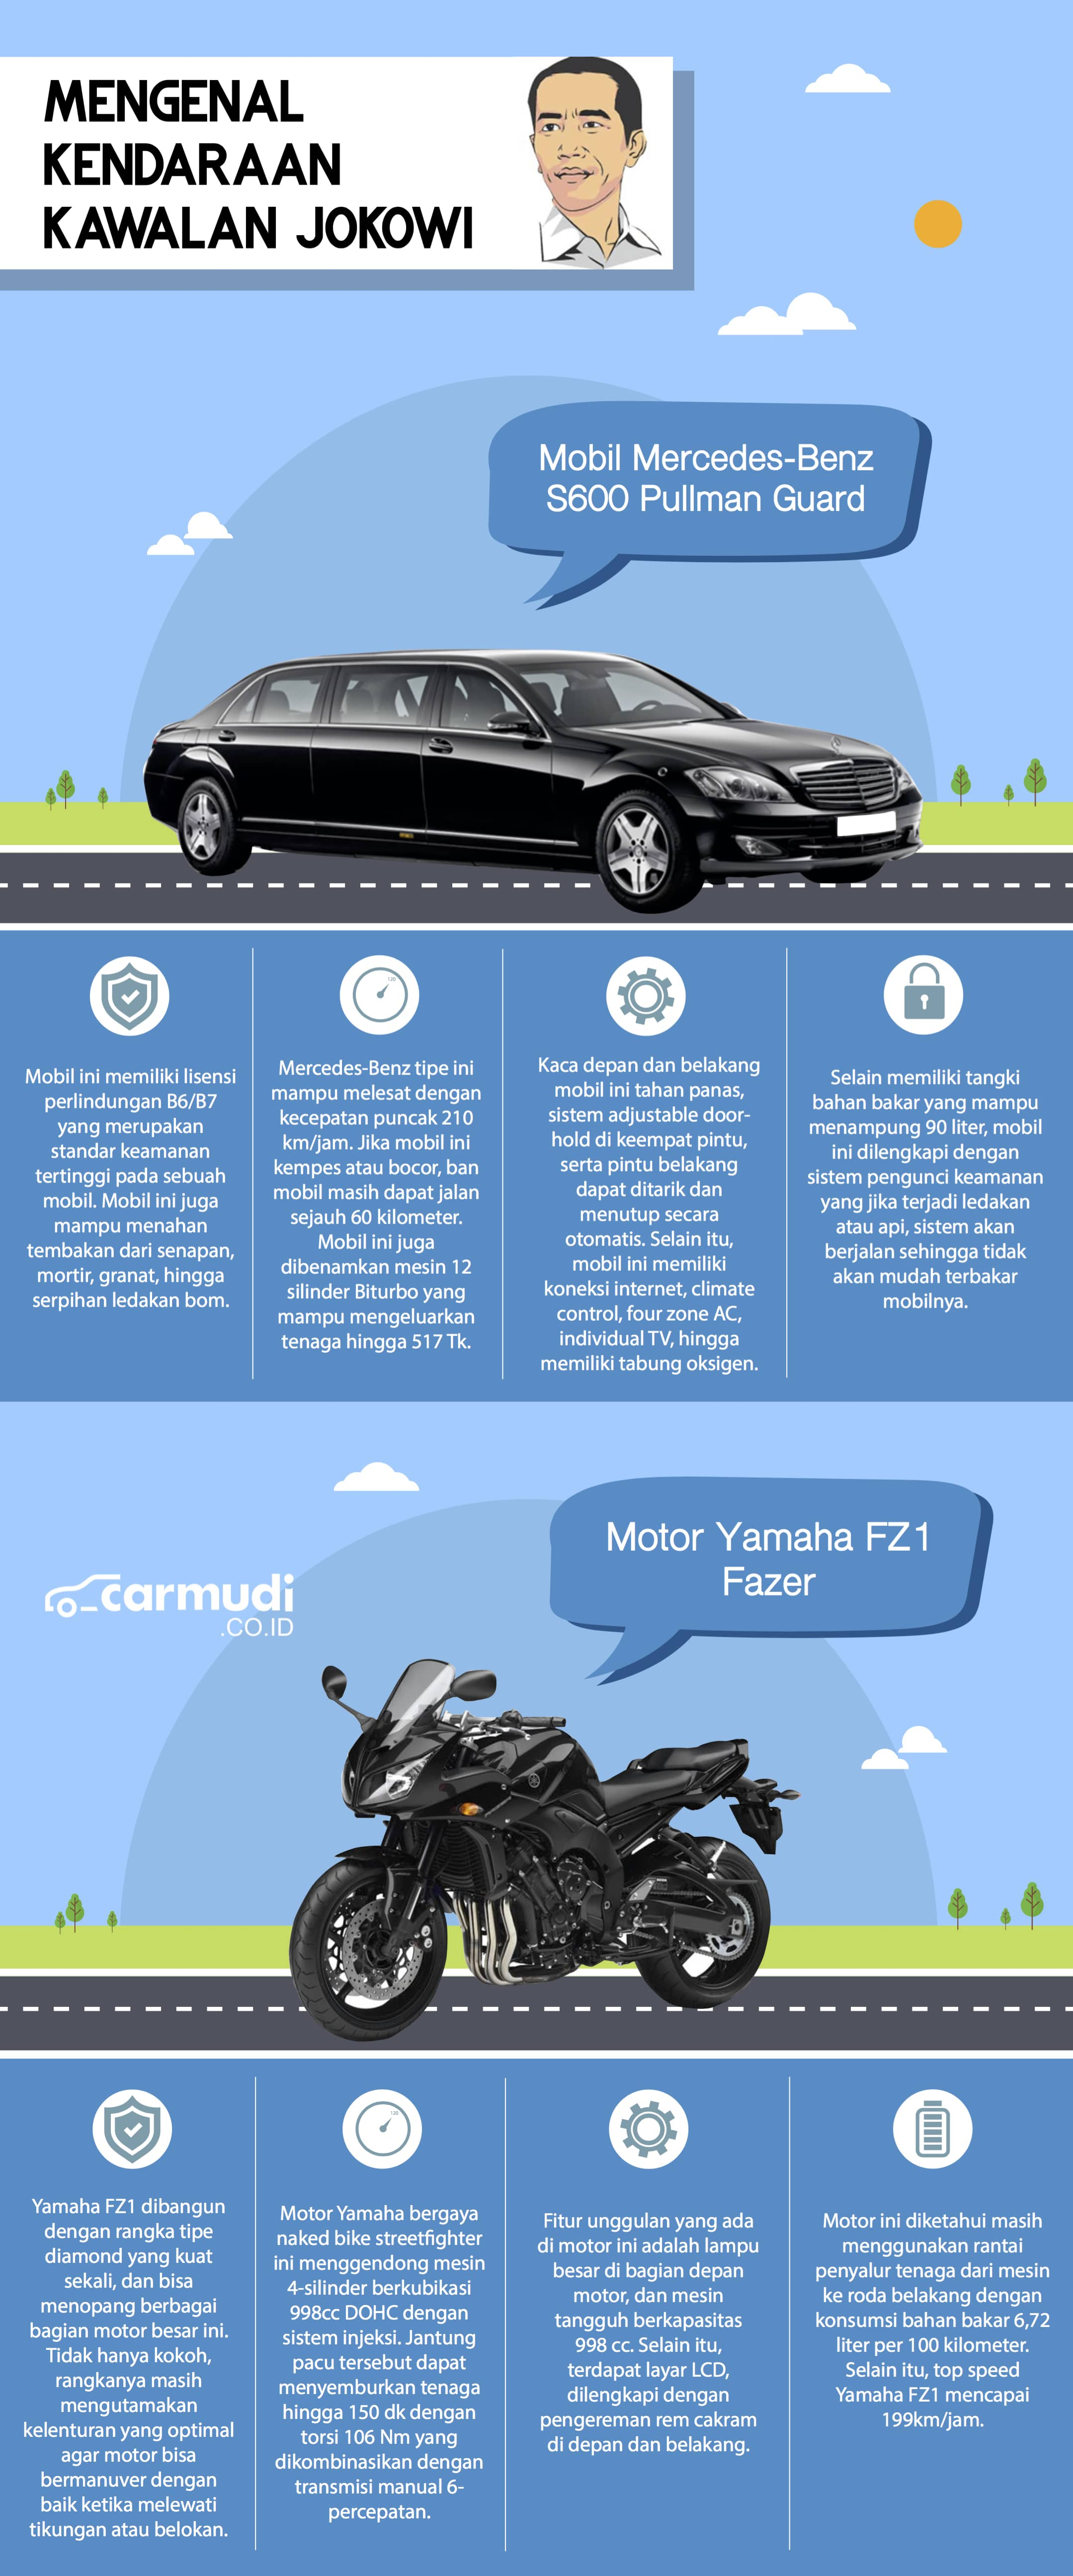 Infografis: Melihat Spesifikasi Kendaraan Pengawal Presiden Joko Widodo